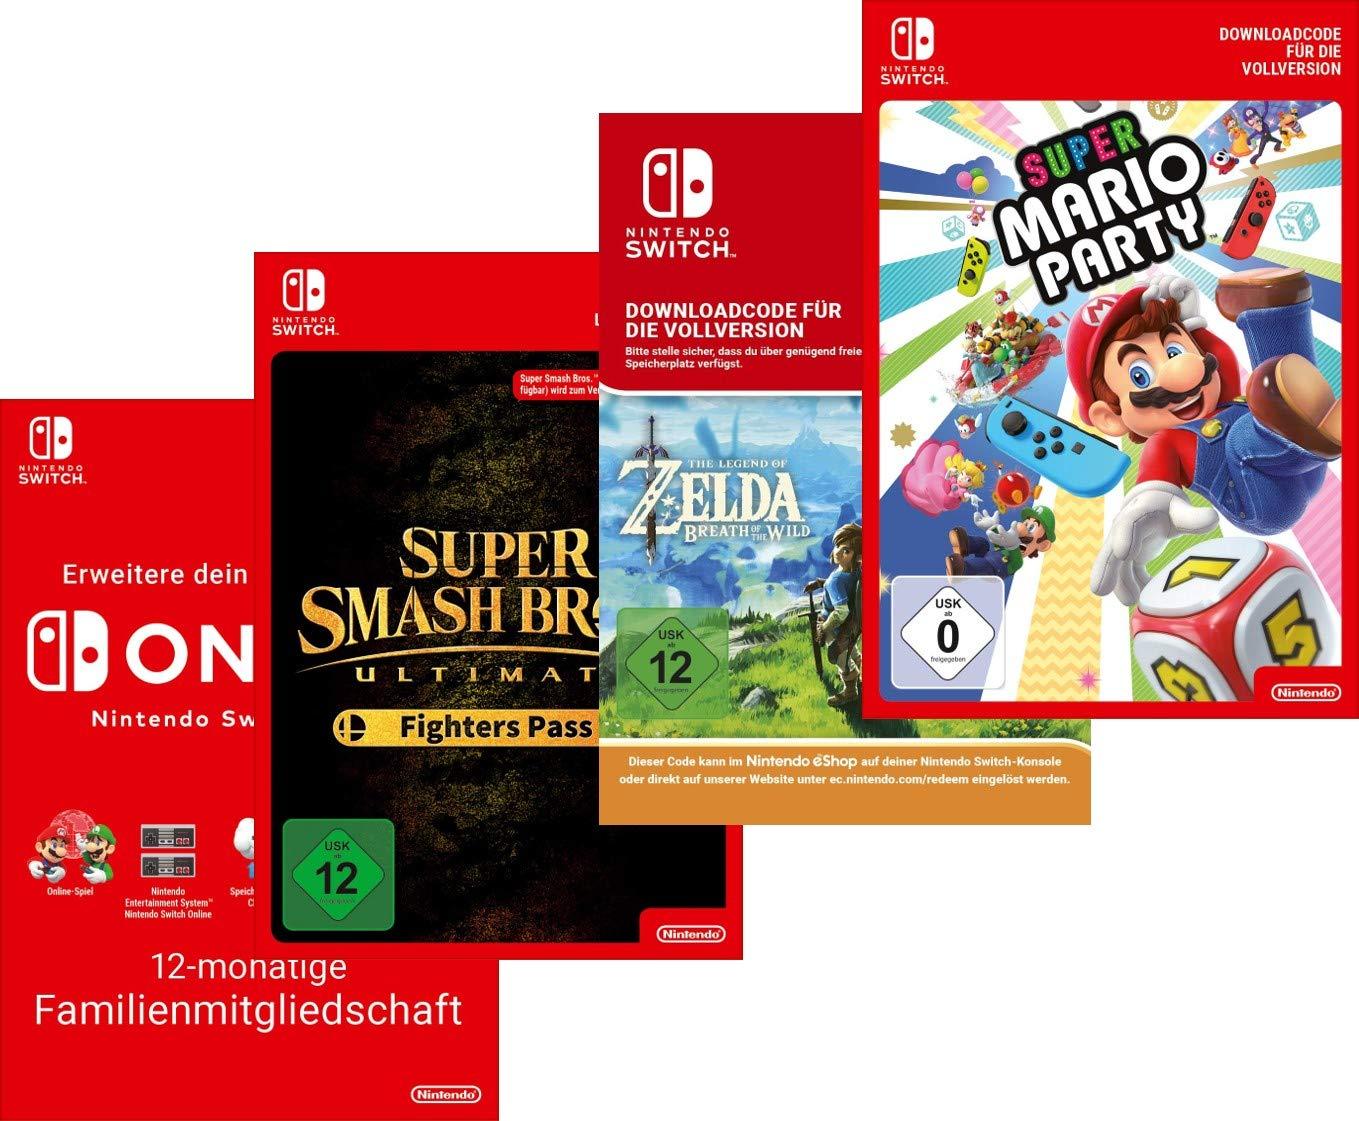 Bis zu 25% Rabatt: Switch Games Top-Seller, DLCs & Online Mitgliedschaft